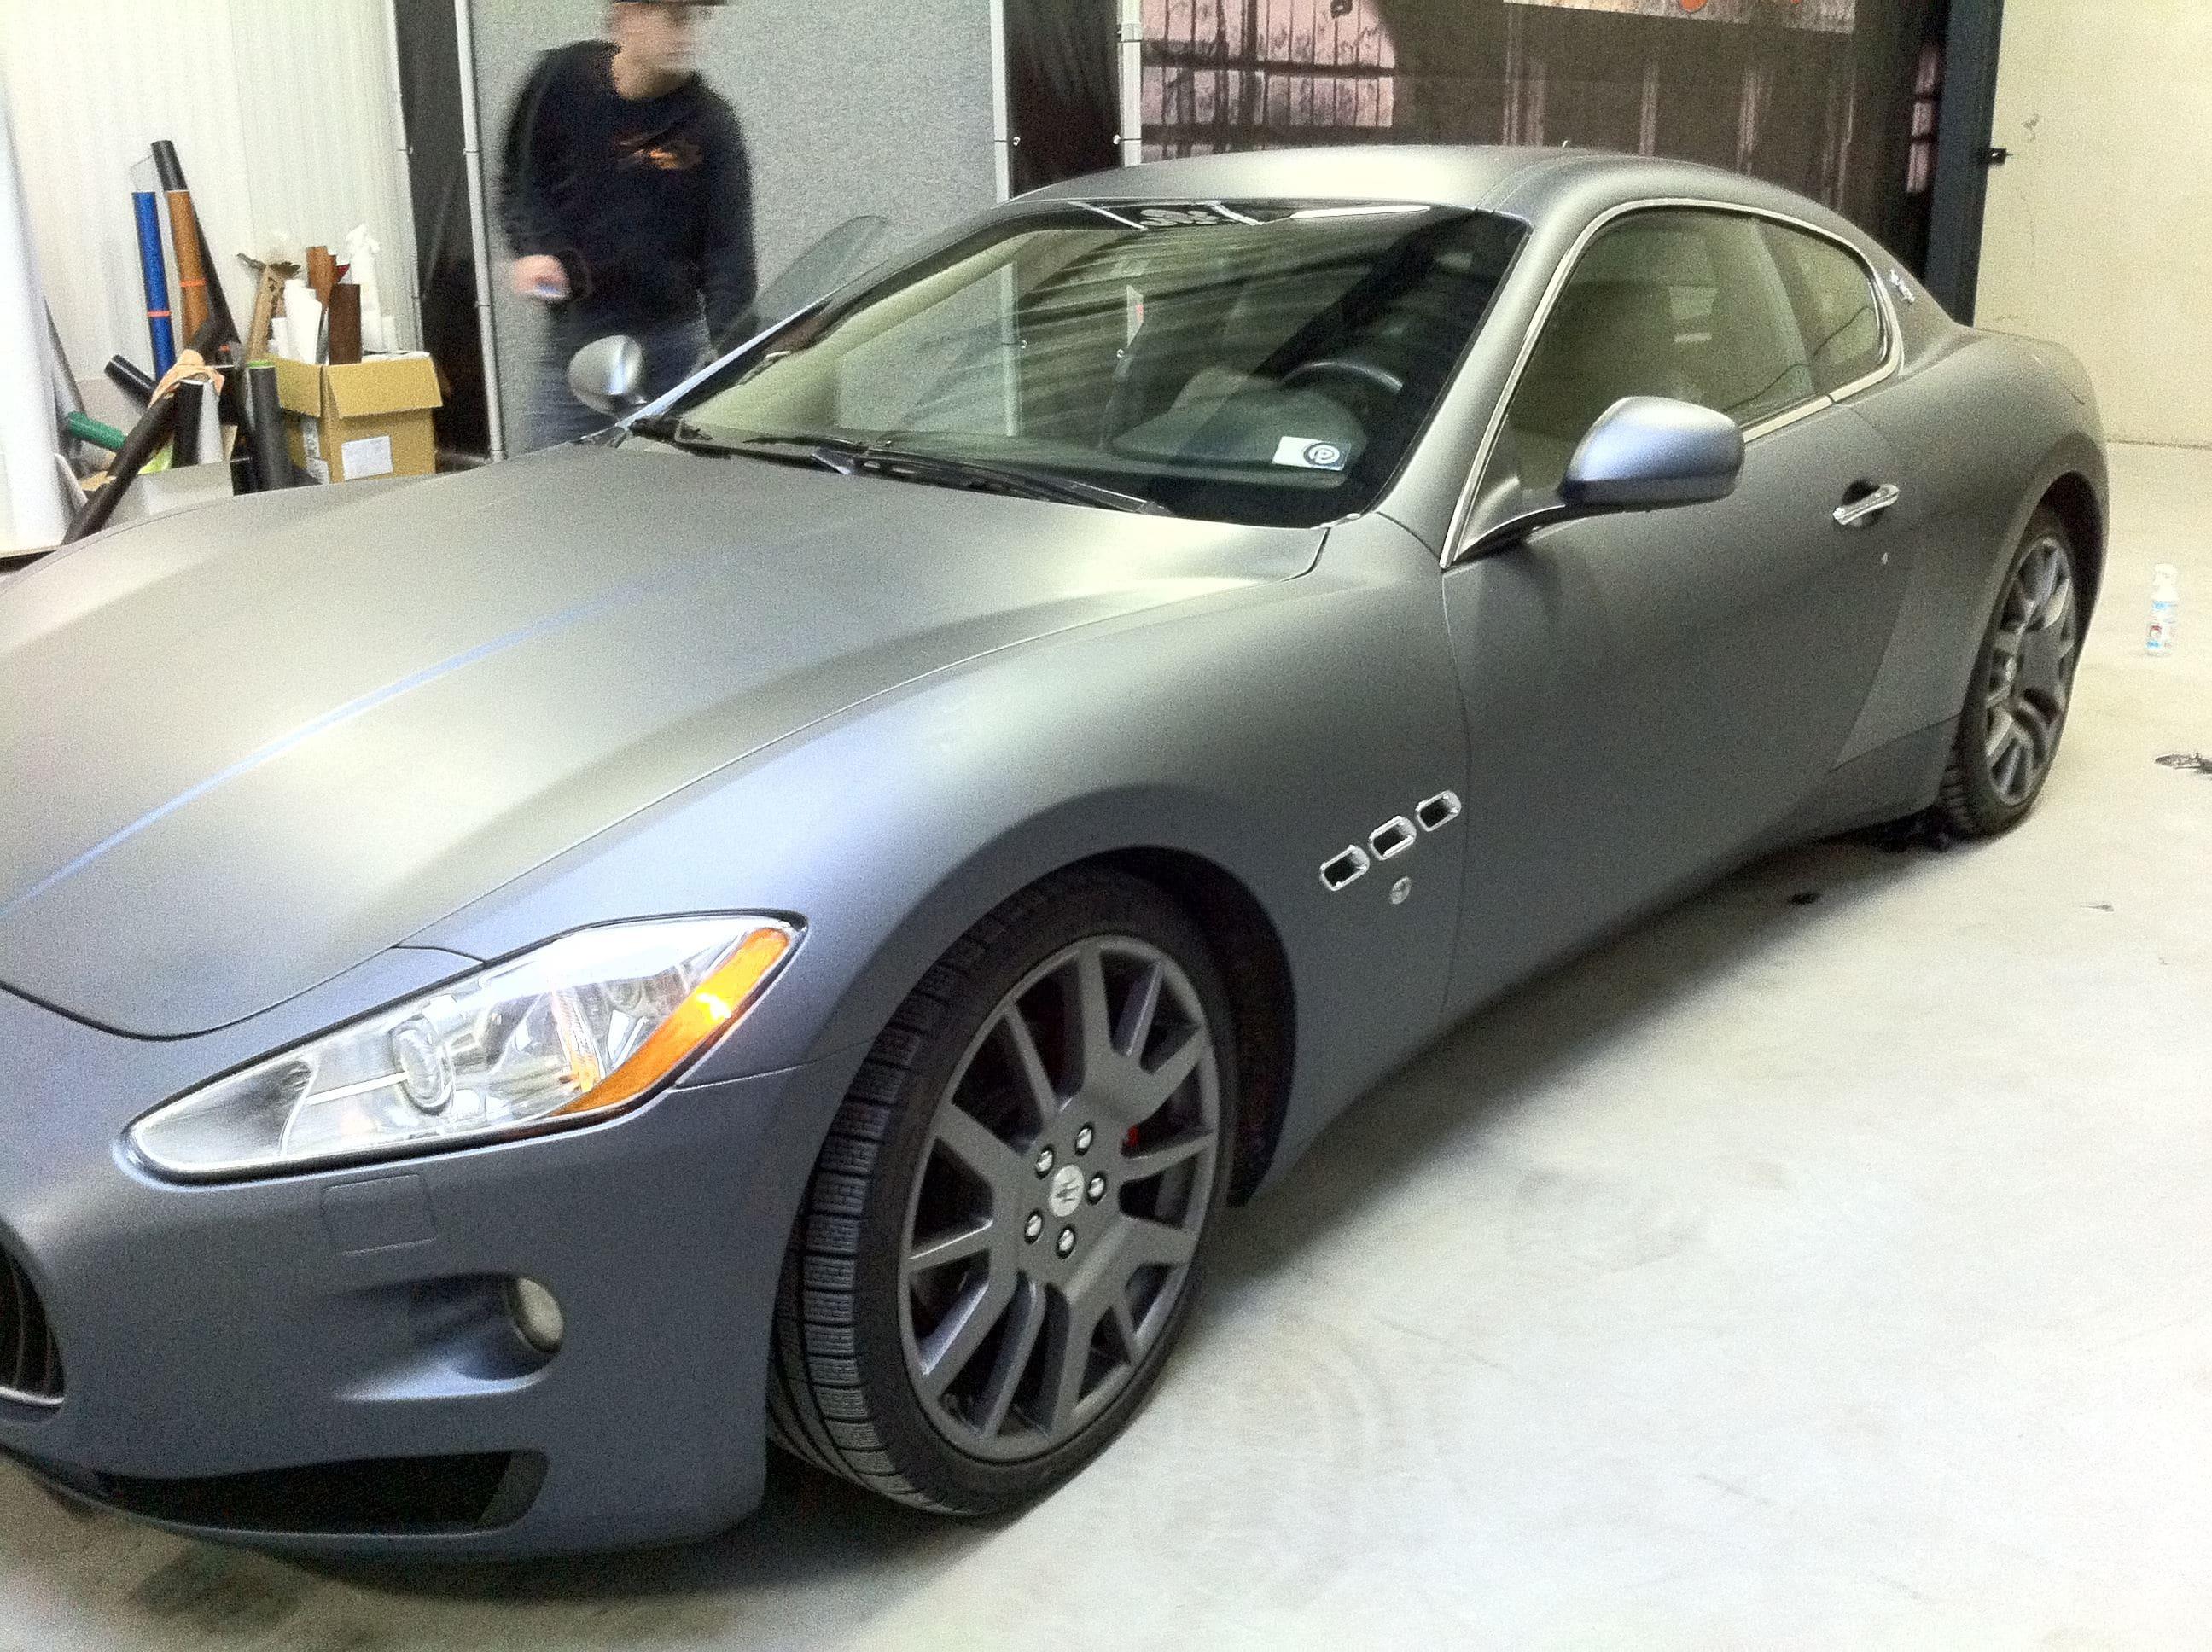 Maserati Gran Turismo met Mat Zwarte Wrap, Carwrapping door Wrapmyride.nu Foto-nr:6035, ©2020